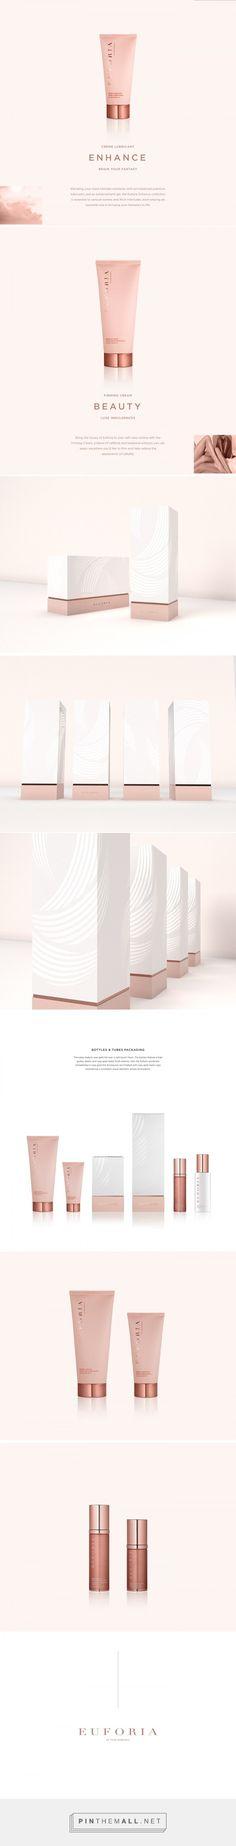 Euforia Luxury Intimacy Product Packaging by Eric DeMoss | Logo Designer Bradenton, Web Design Sarasota, Tampa Fivestar Branding Agency #intimacyproducts #packaging #packaginginspiration #packagedesign #package #design #designinspiration